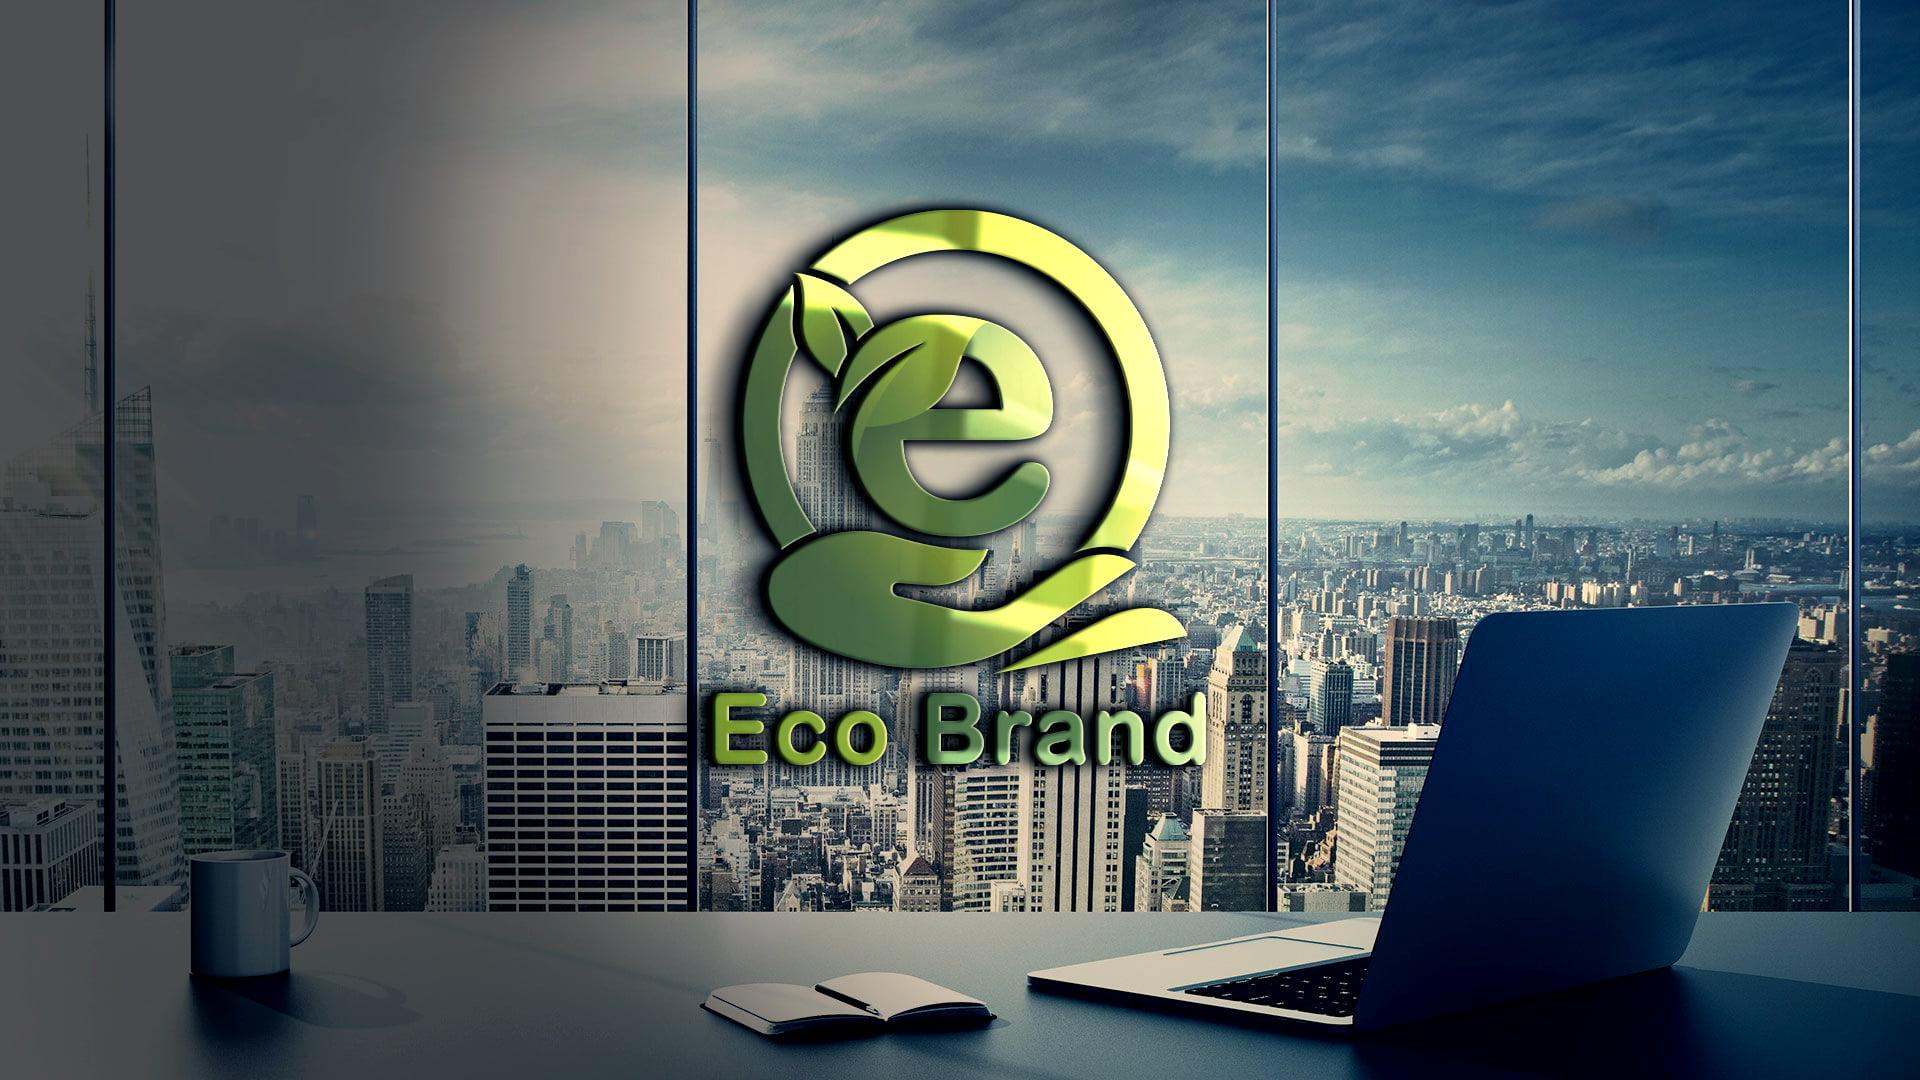 Eco Brand Logo Design Download